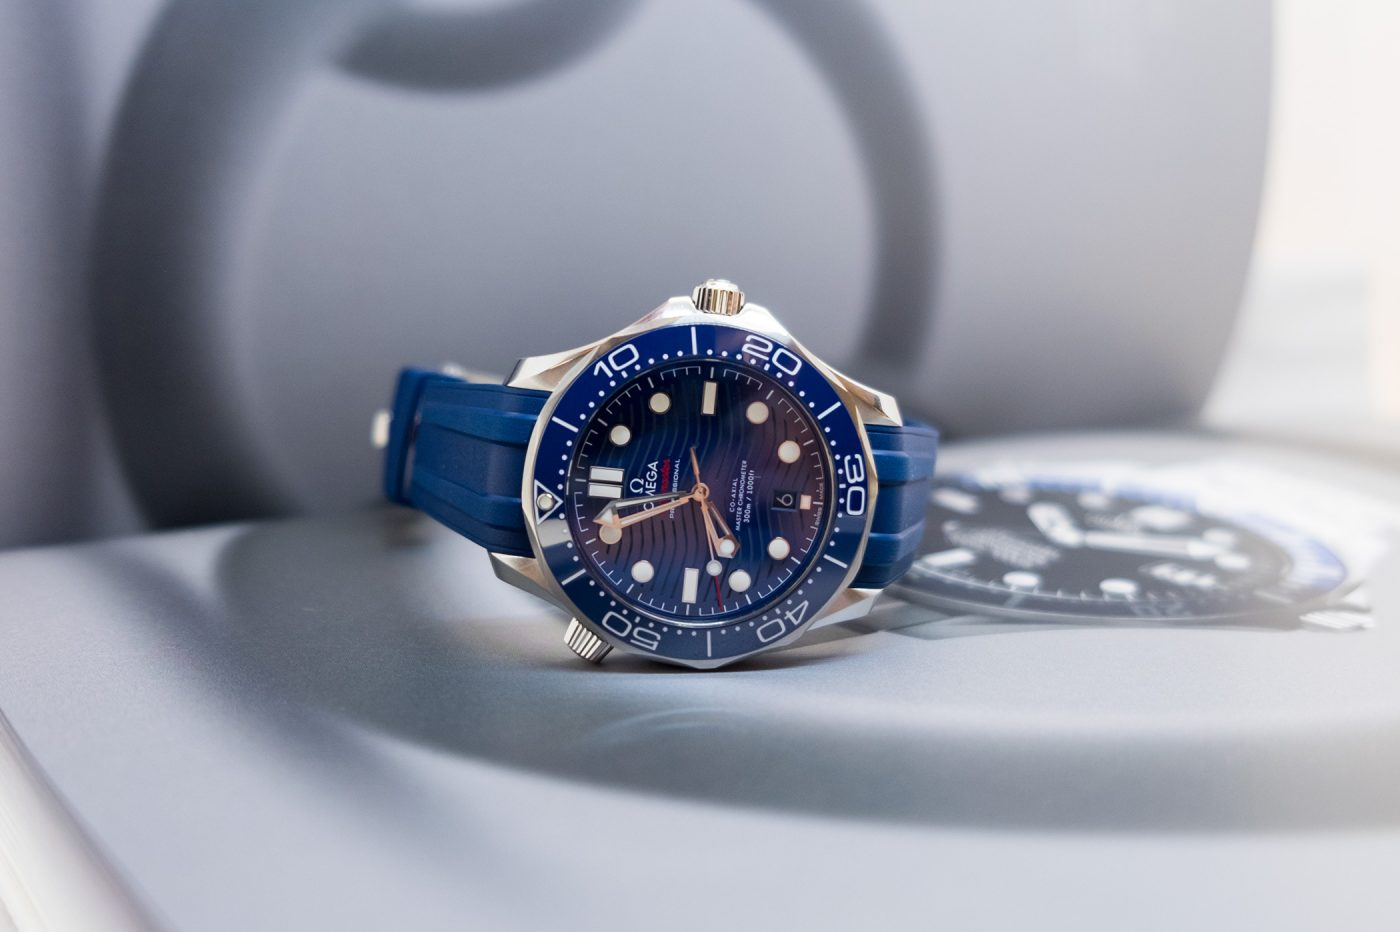 Omega Seamaster Professional Diver 300M z ceramiką i falami na tarczy – Basel 2018 [zdjęcia live, cena]